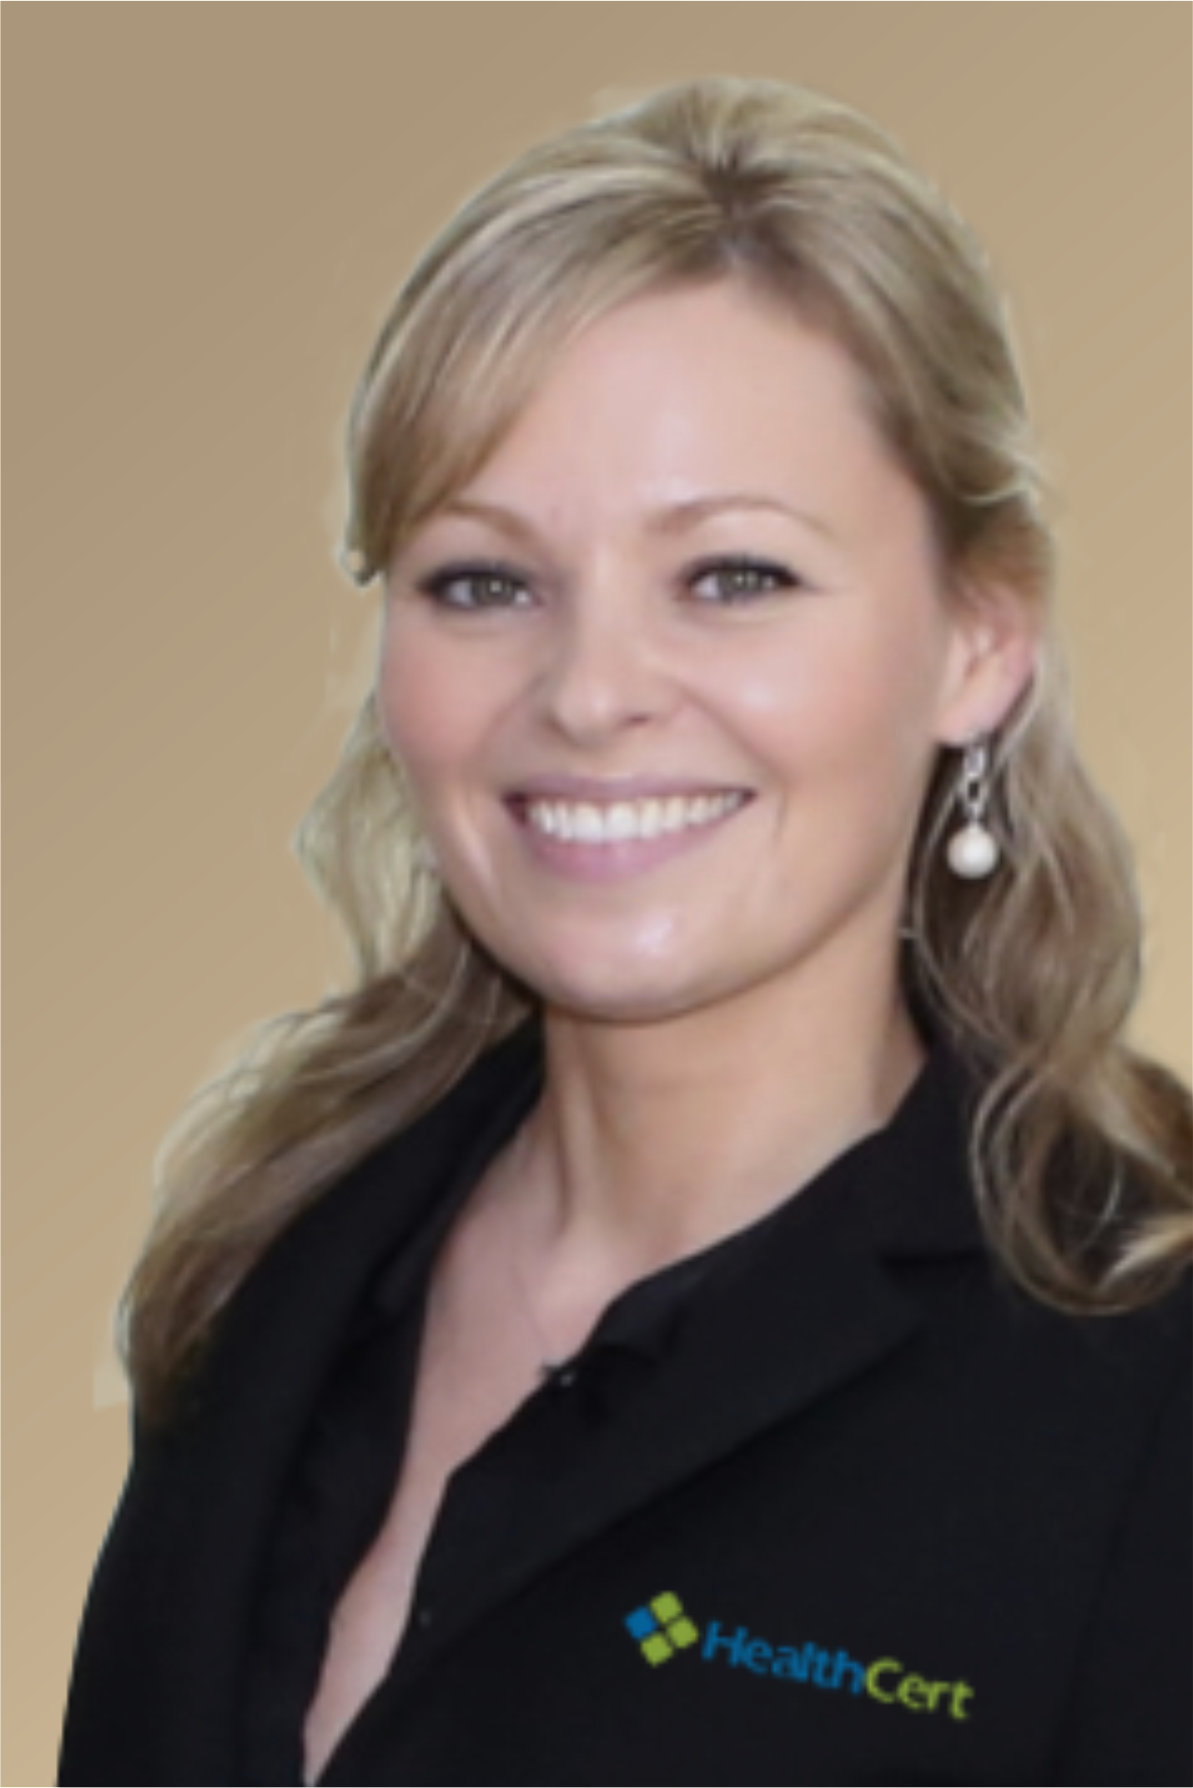 Ina_Heinitz_Marketing_Coordinator